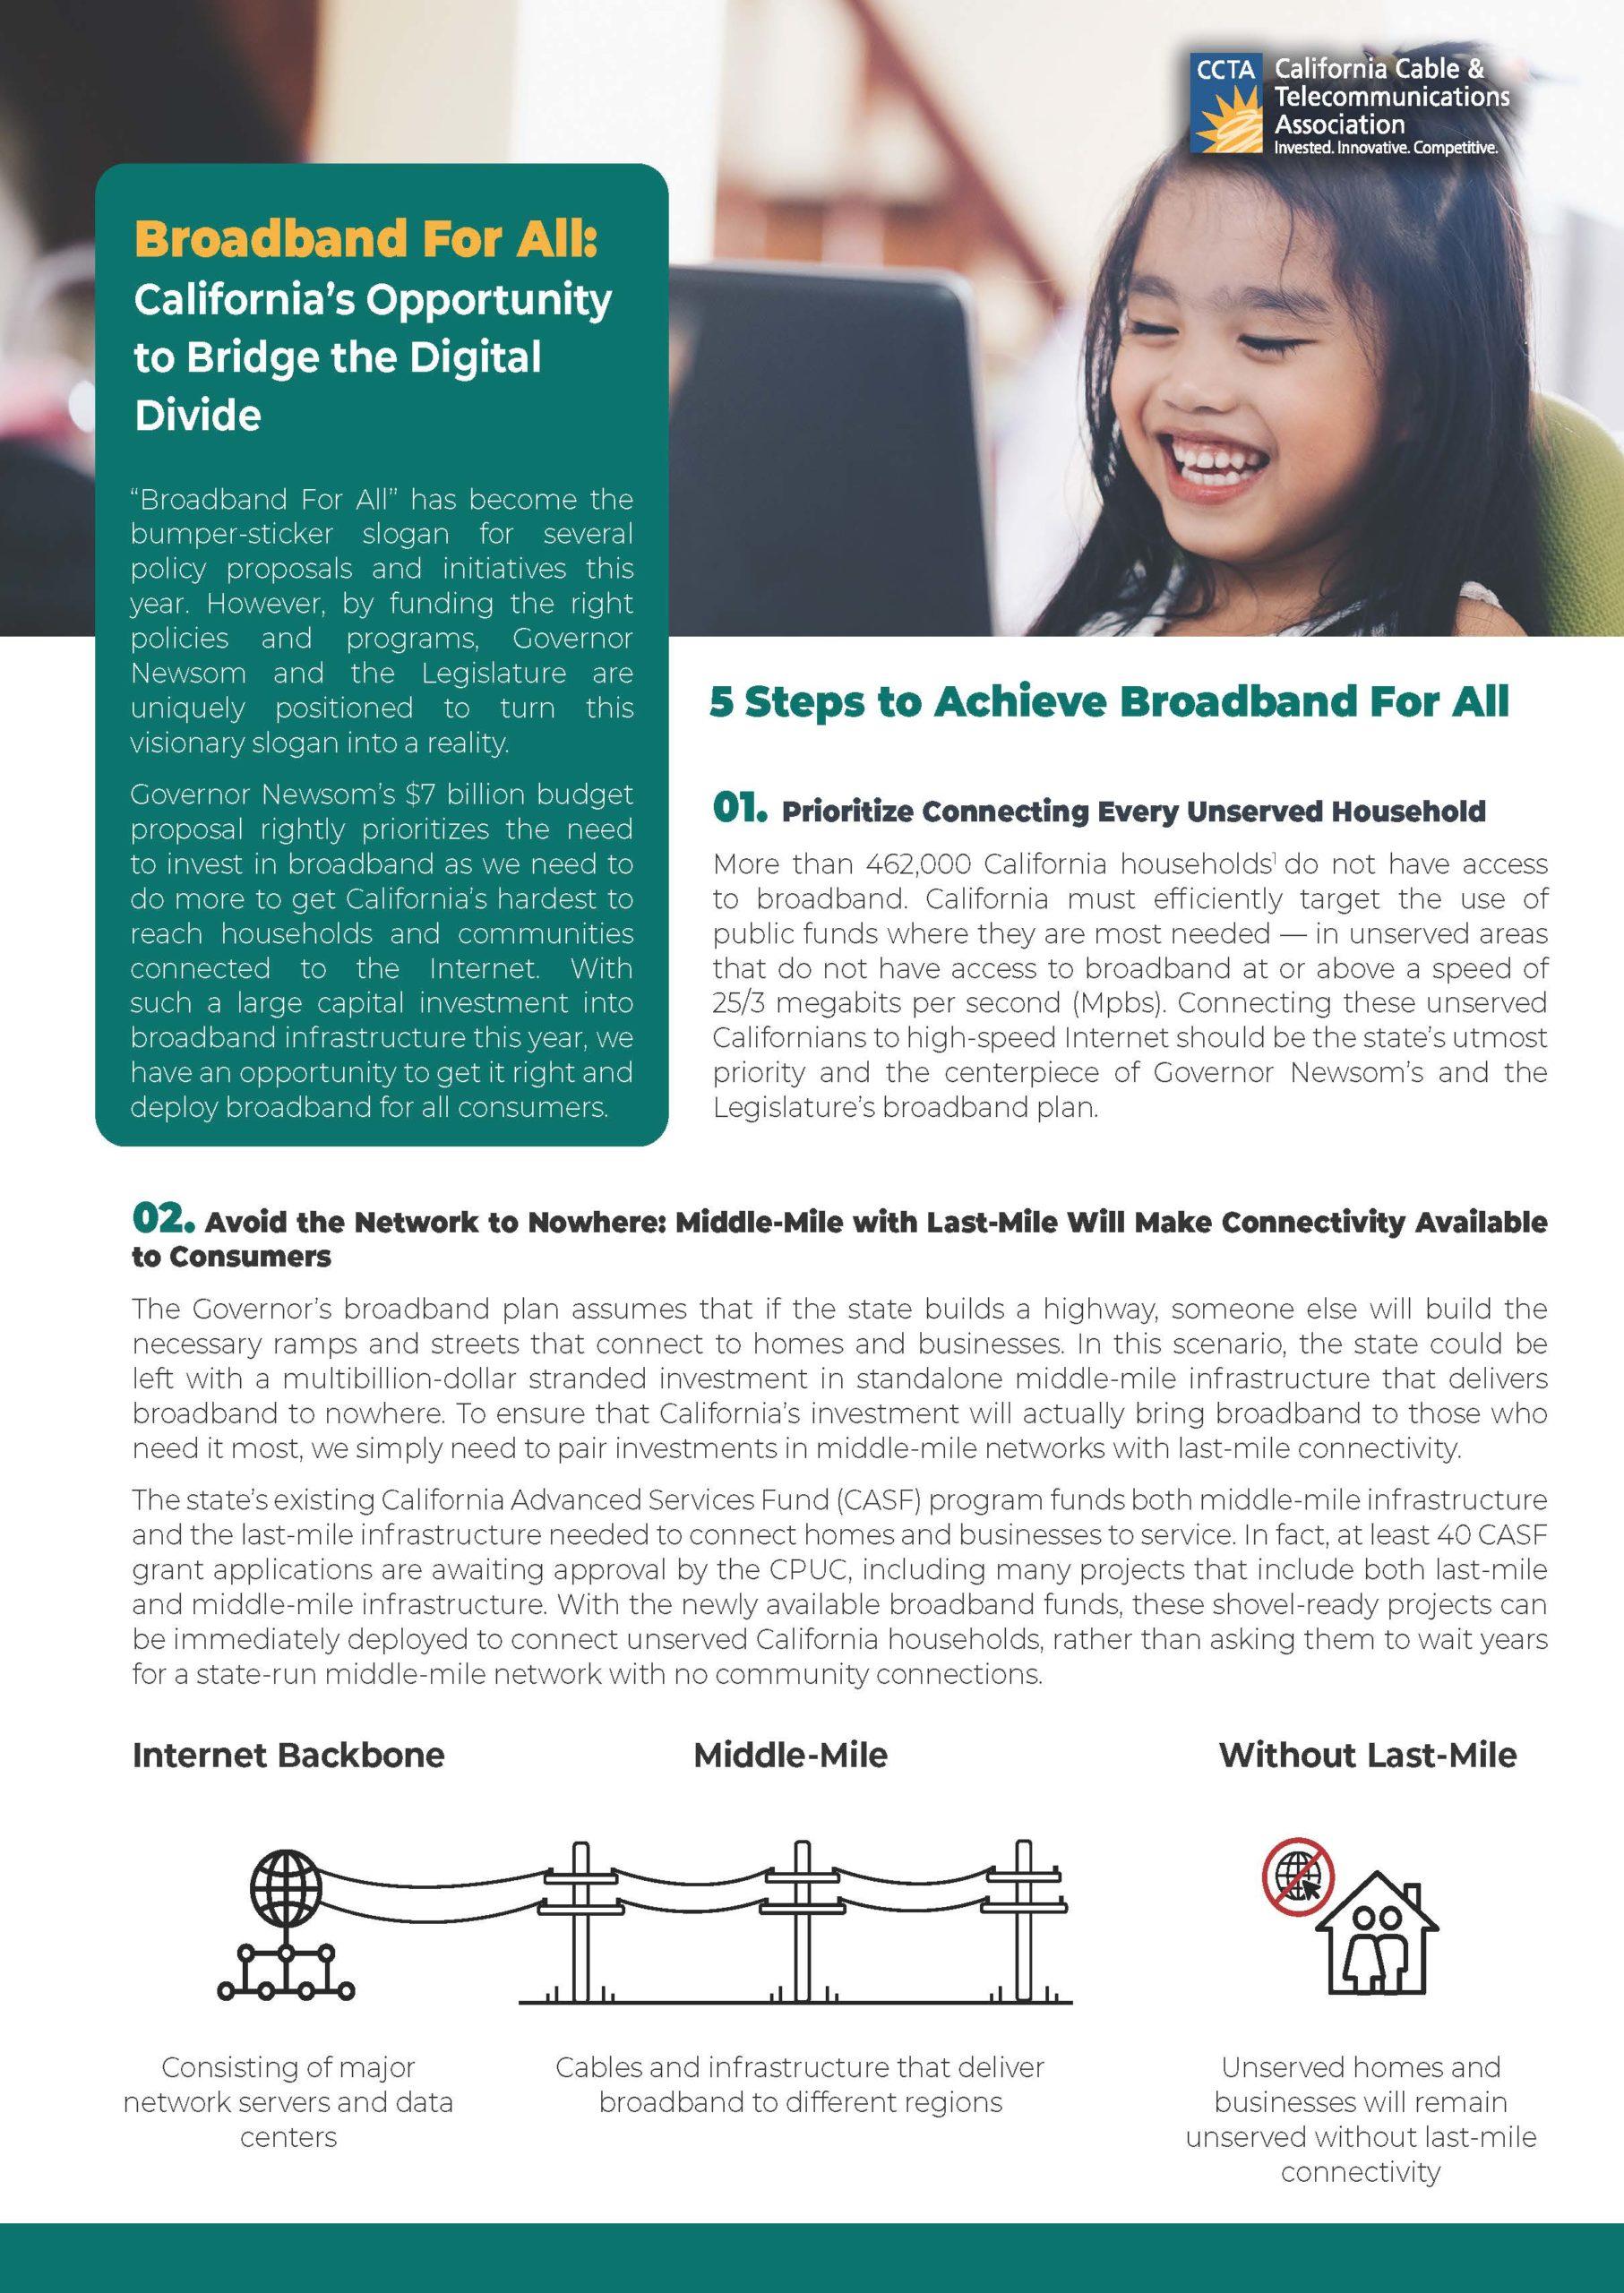 CCTA Governor Newsom Broadband Proposal Fact Sheet v6.15.21 (002)_Page_1